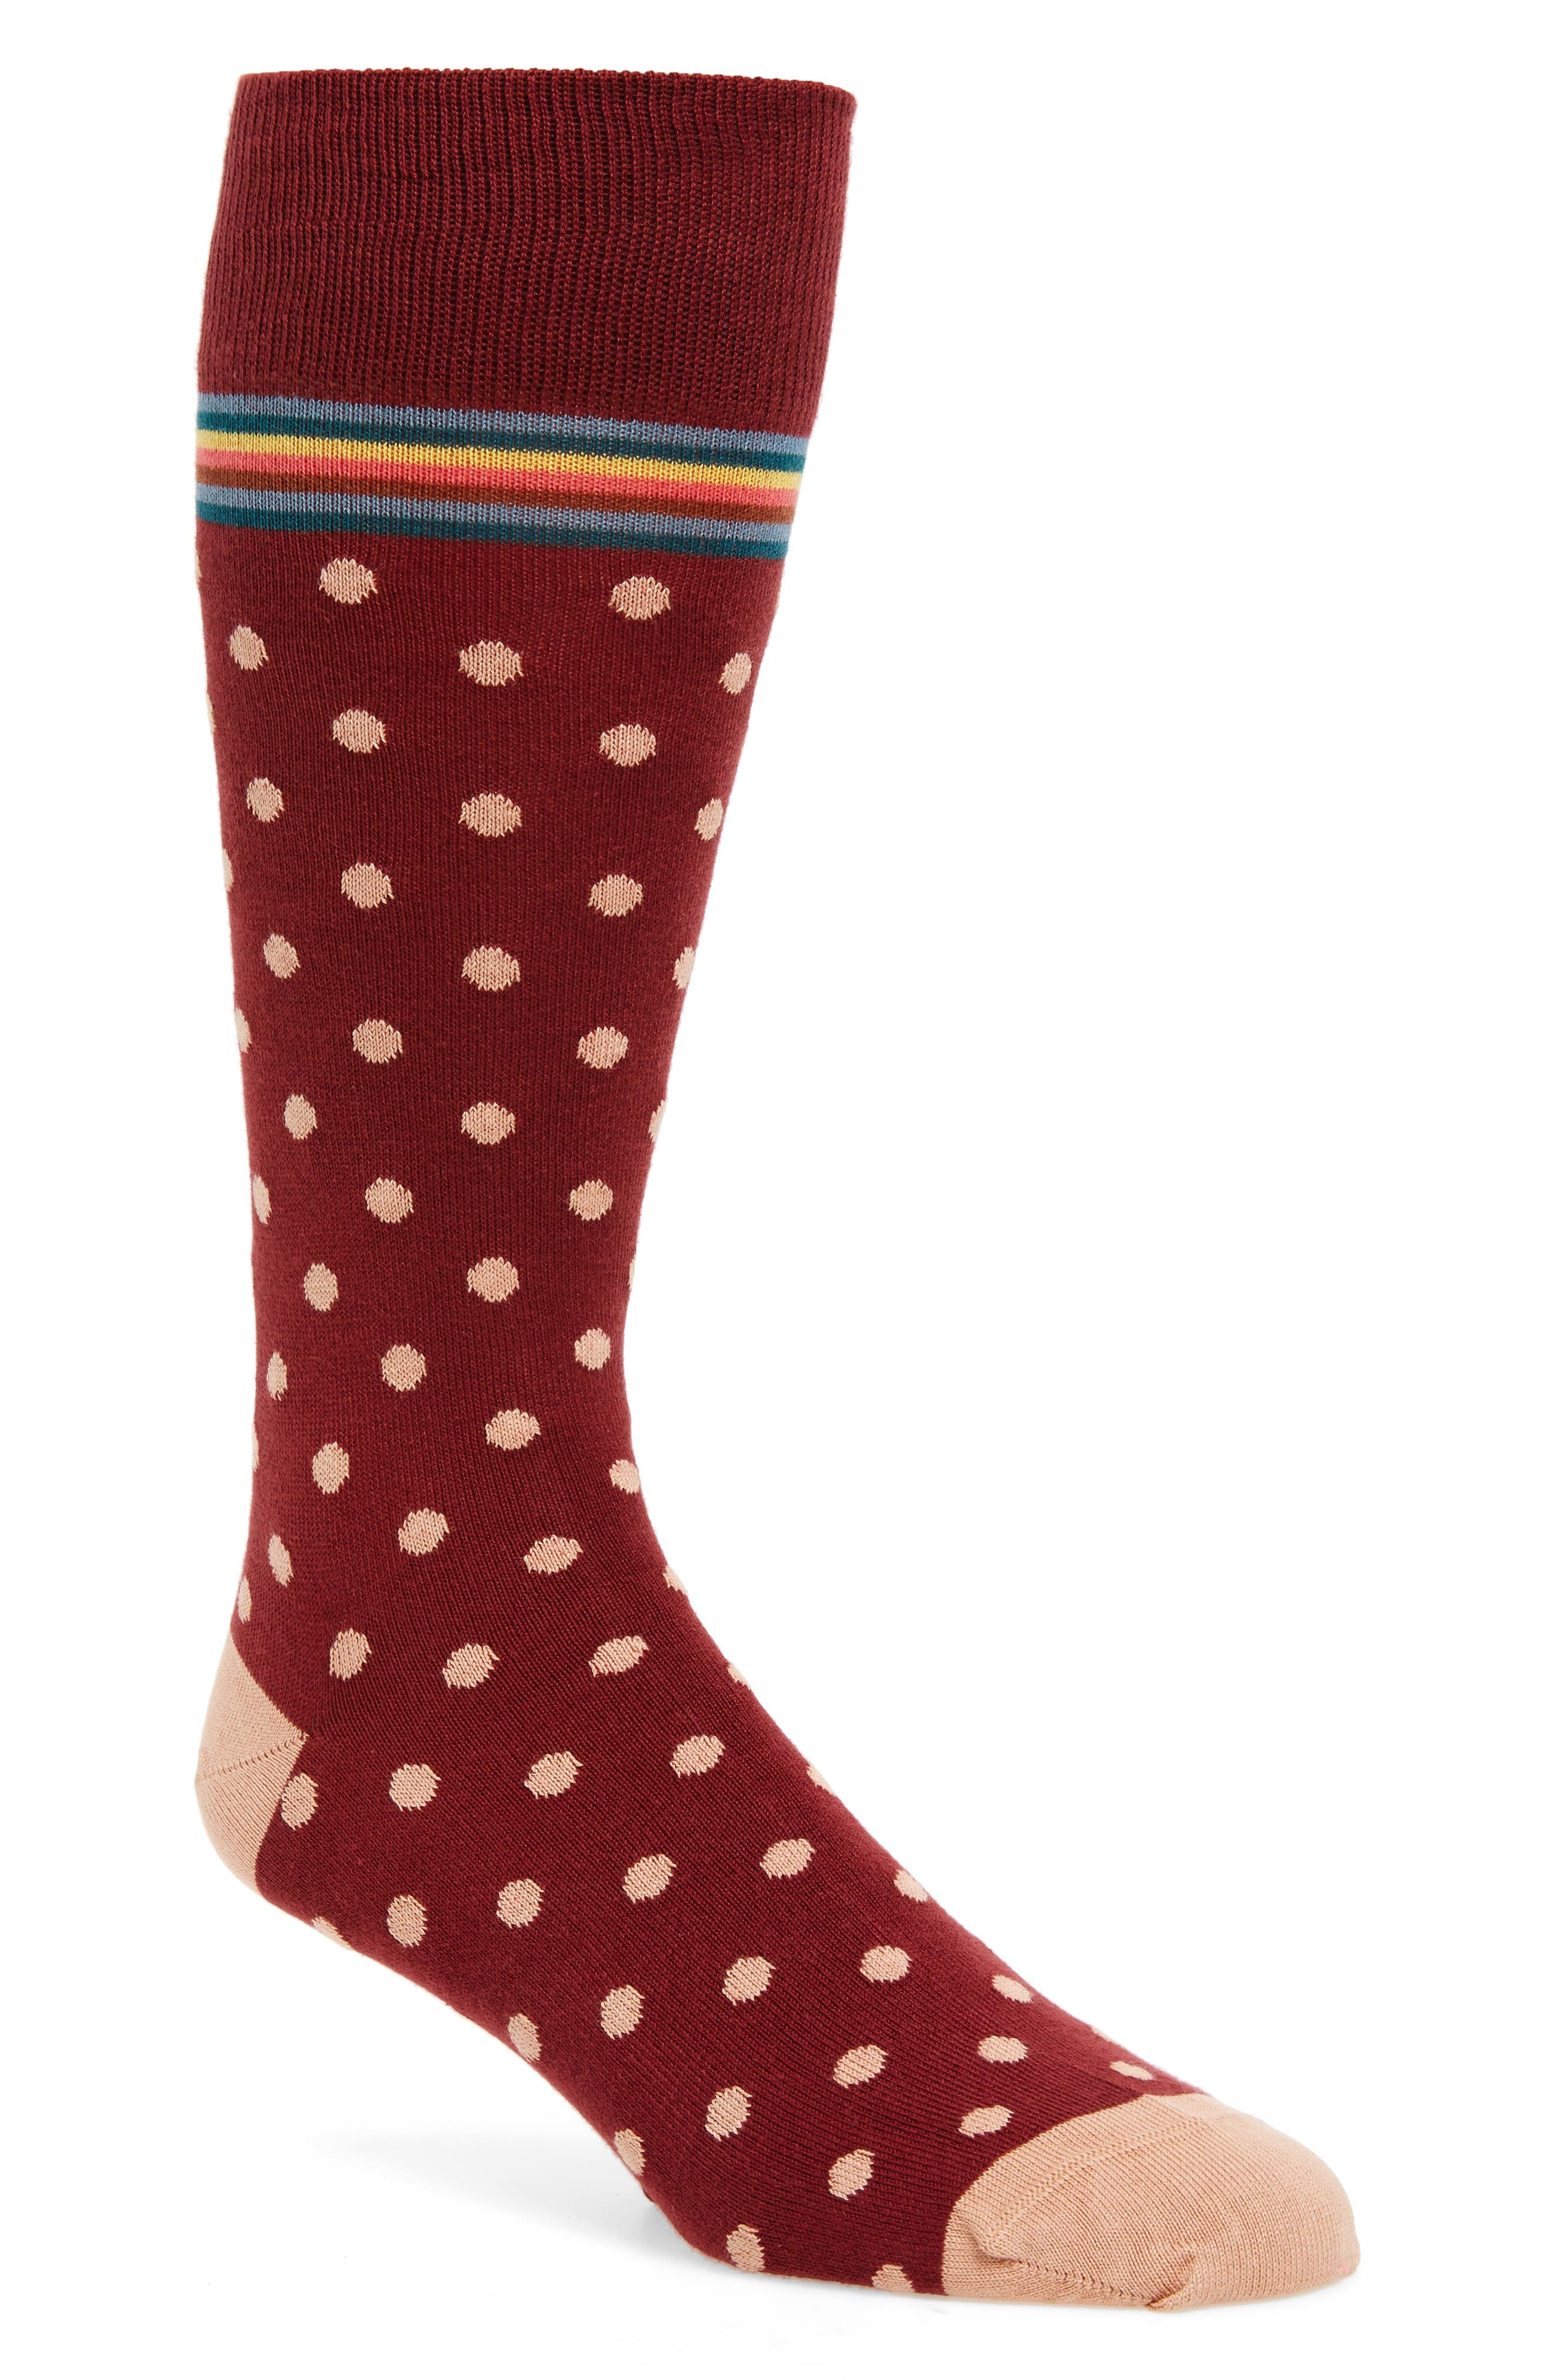 Main Image - Paul Smith Signature Polka Dot Socks